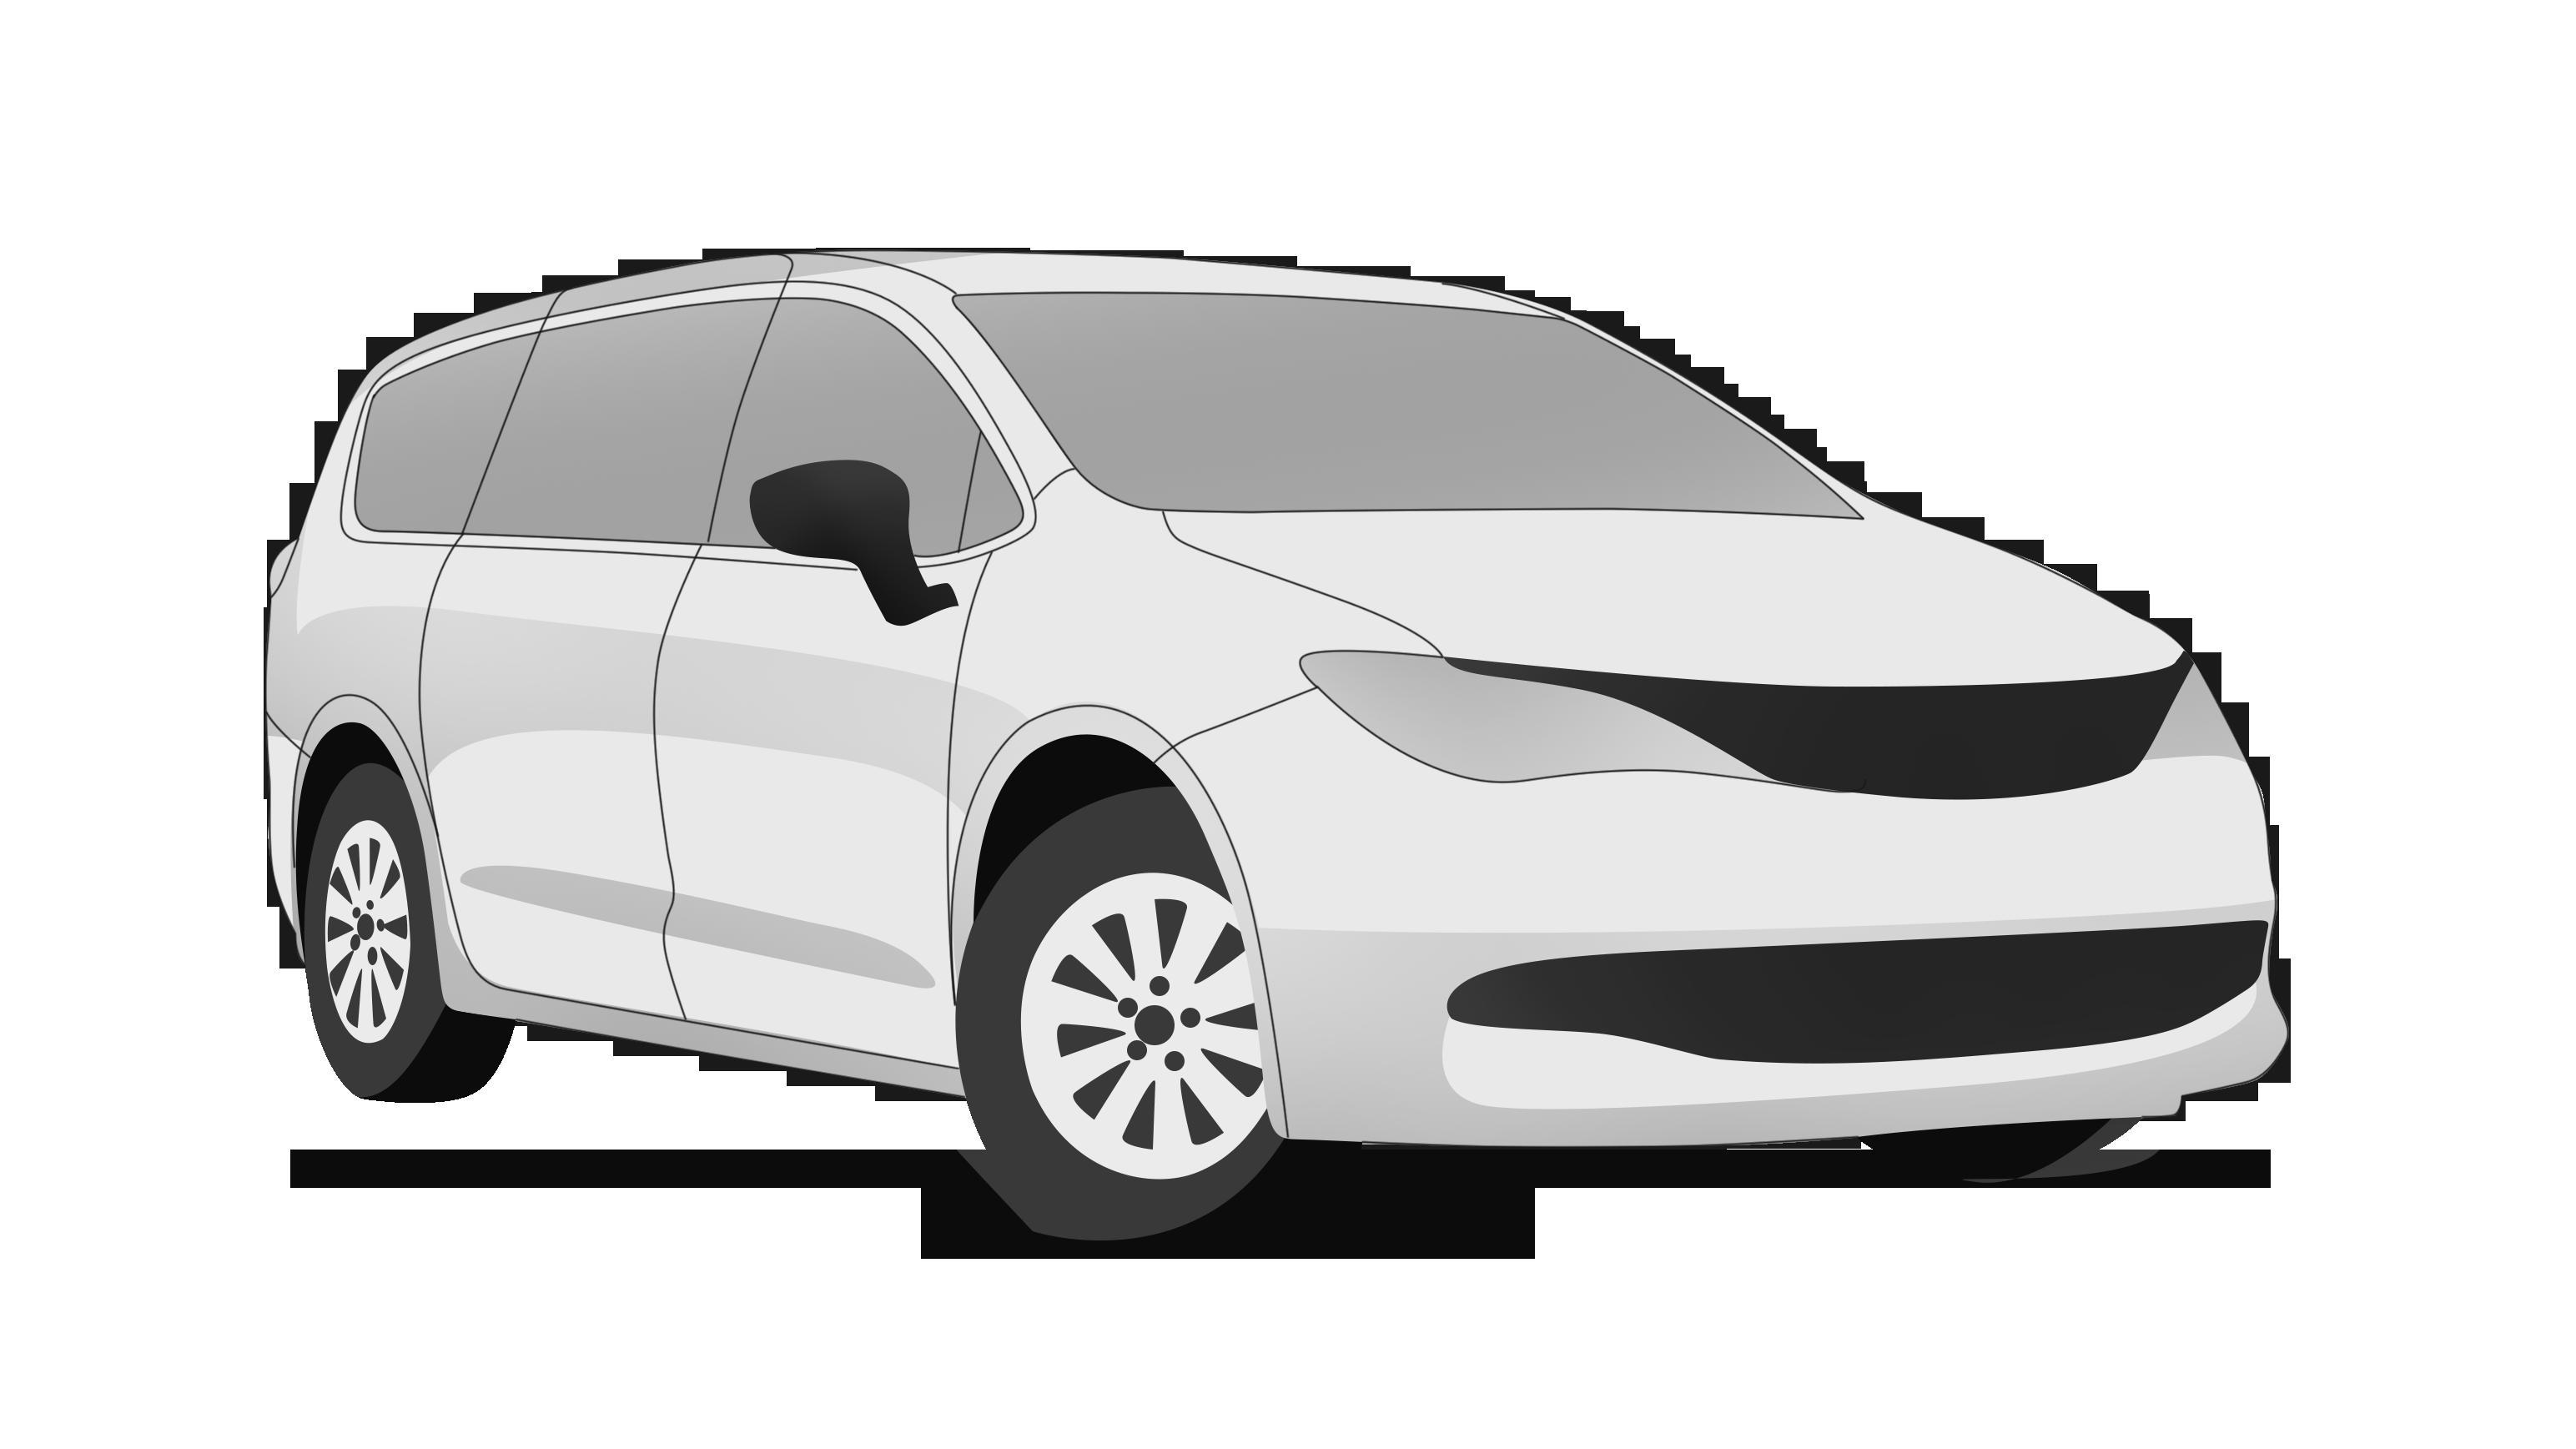 Car Illustration Vehicle Graphic Design Services Car Illustration Fiverr